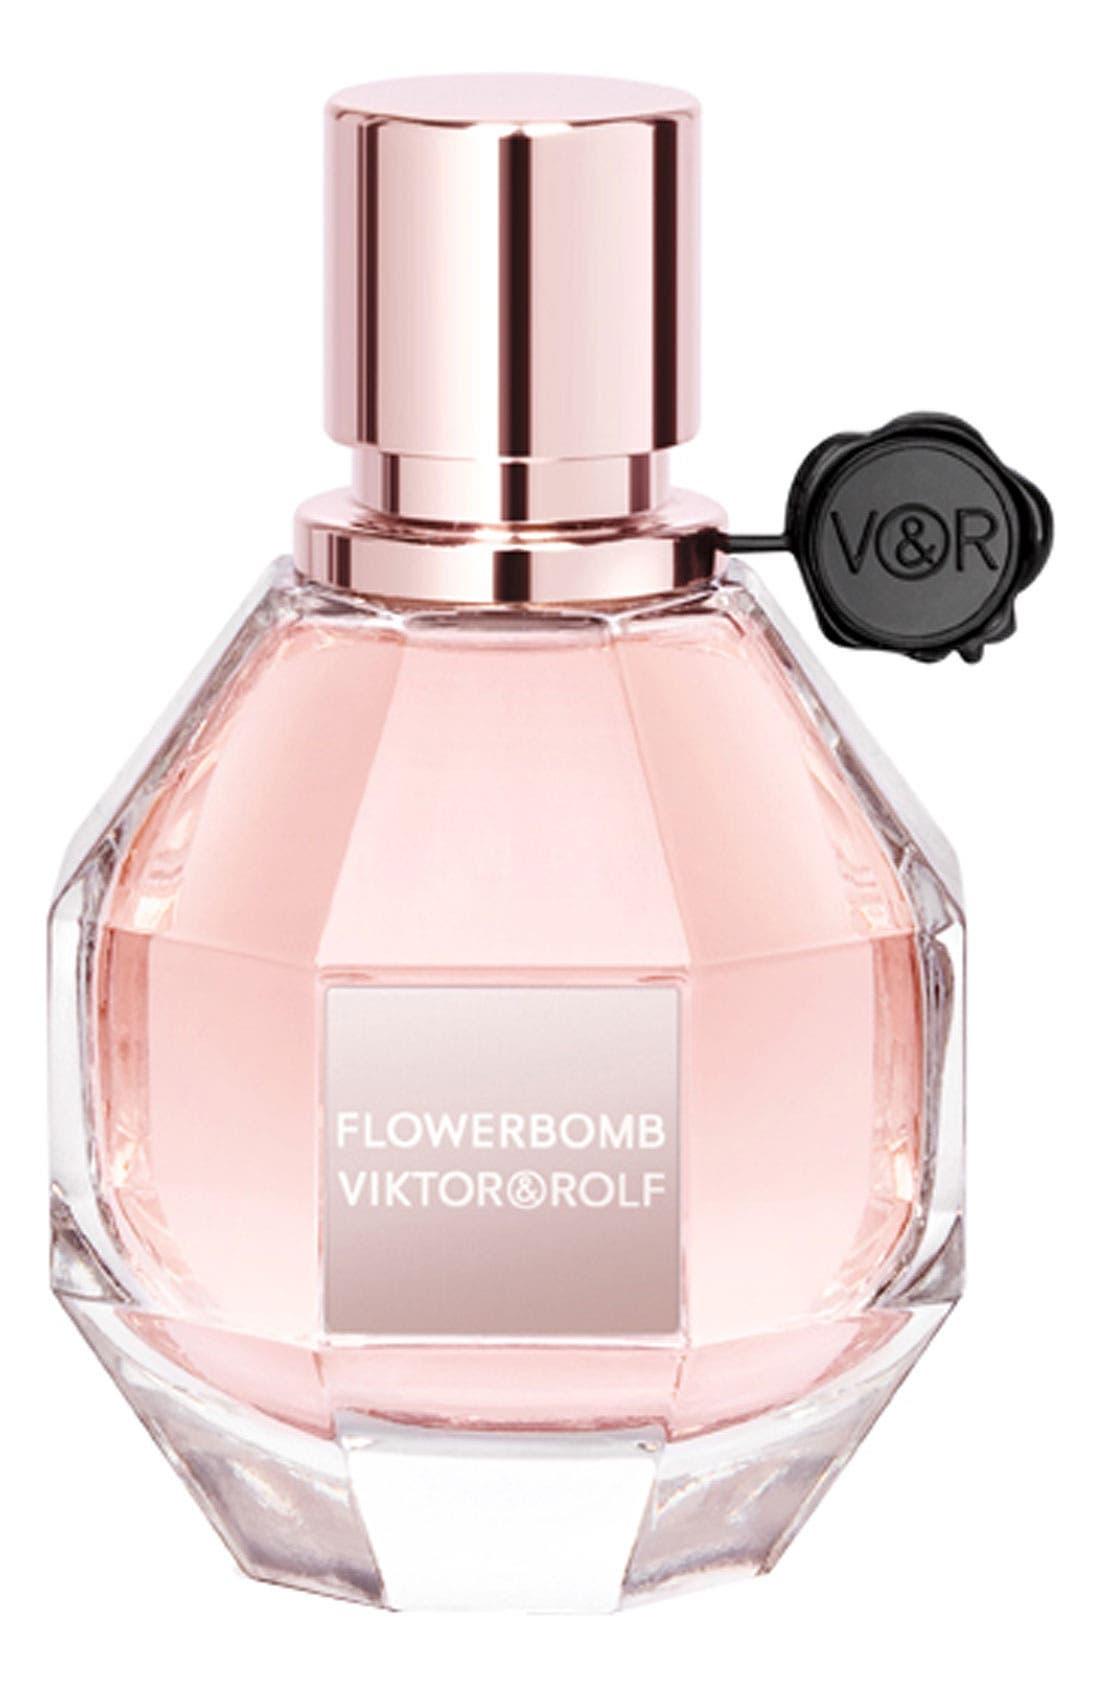 Viktor&Rolf Flowerbomb Eau de Parfum Spray